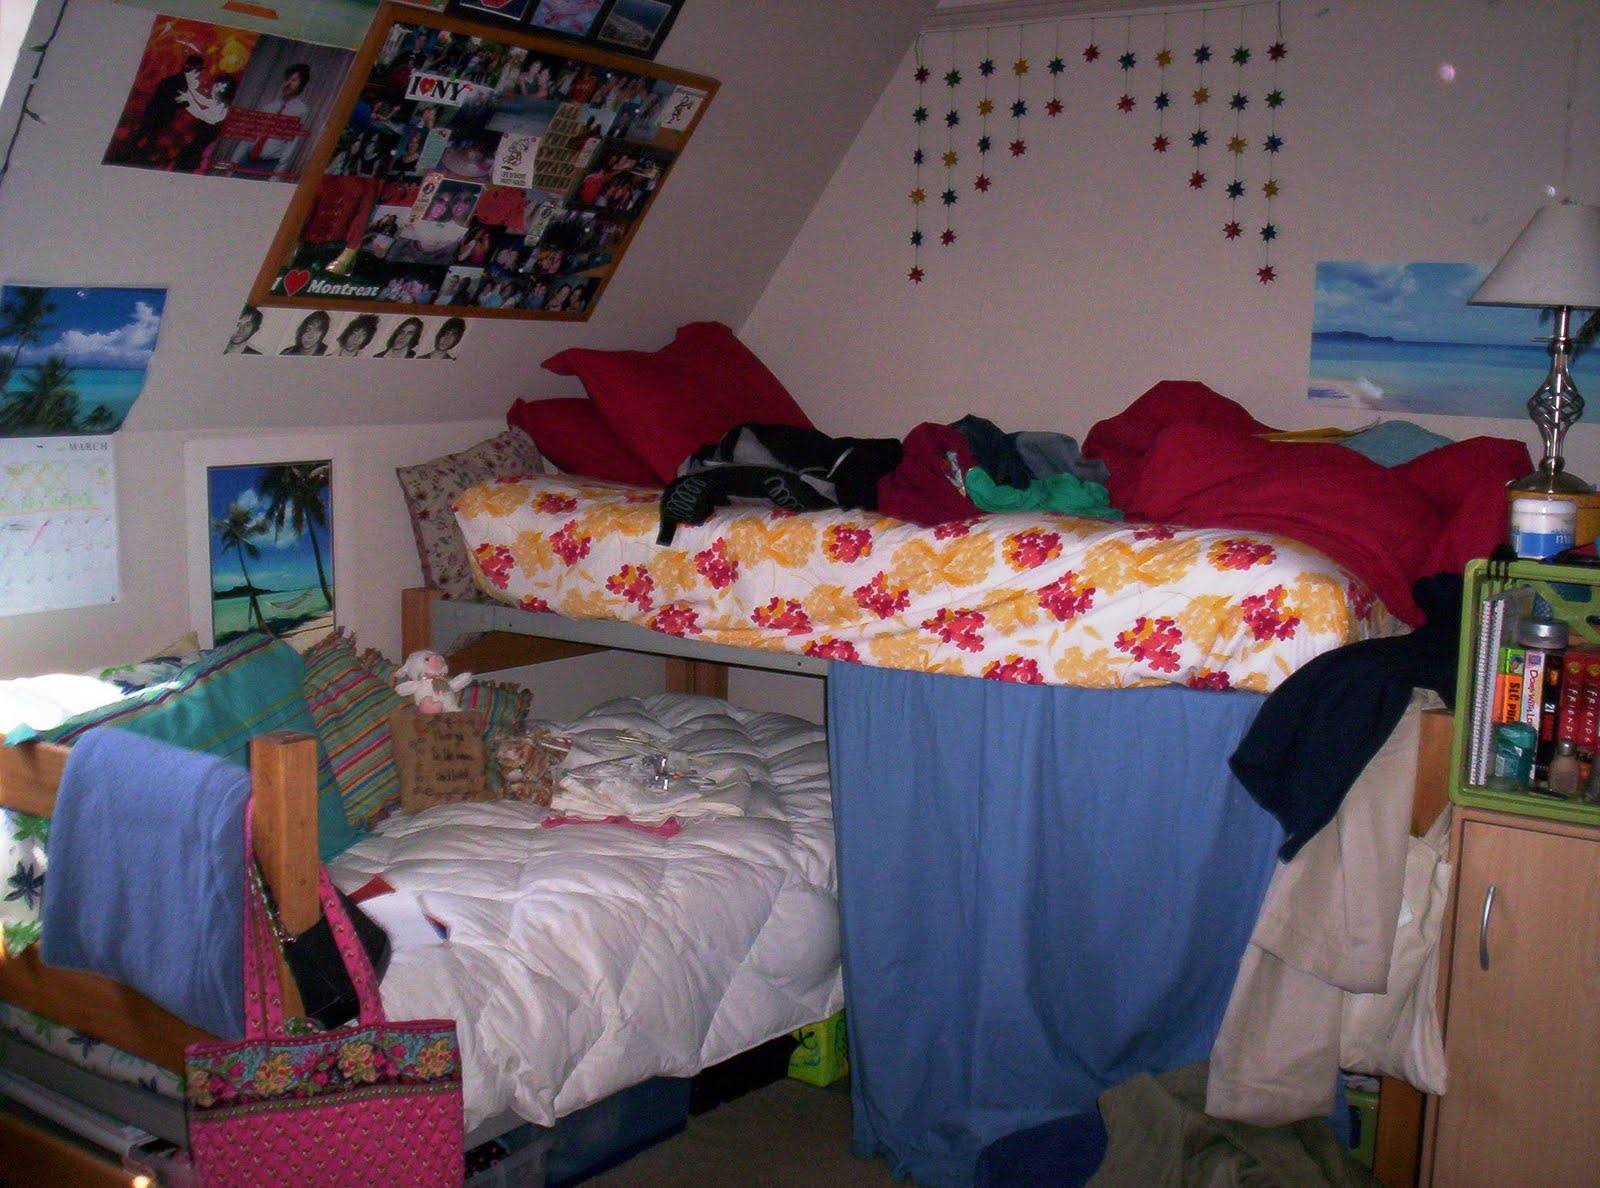 Fsu Bedroom Bedroom Furniture High Resolution